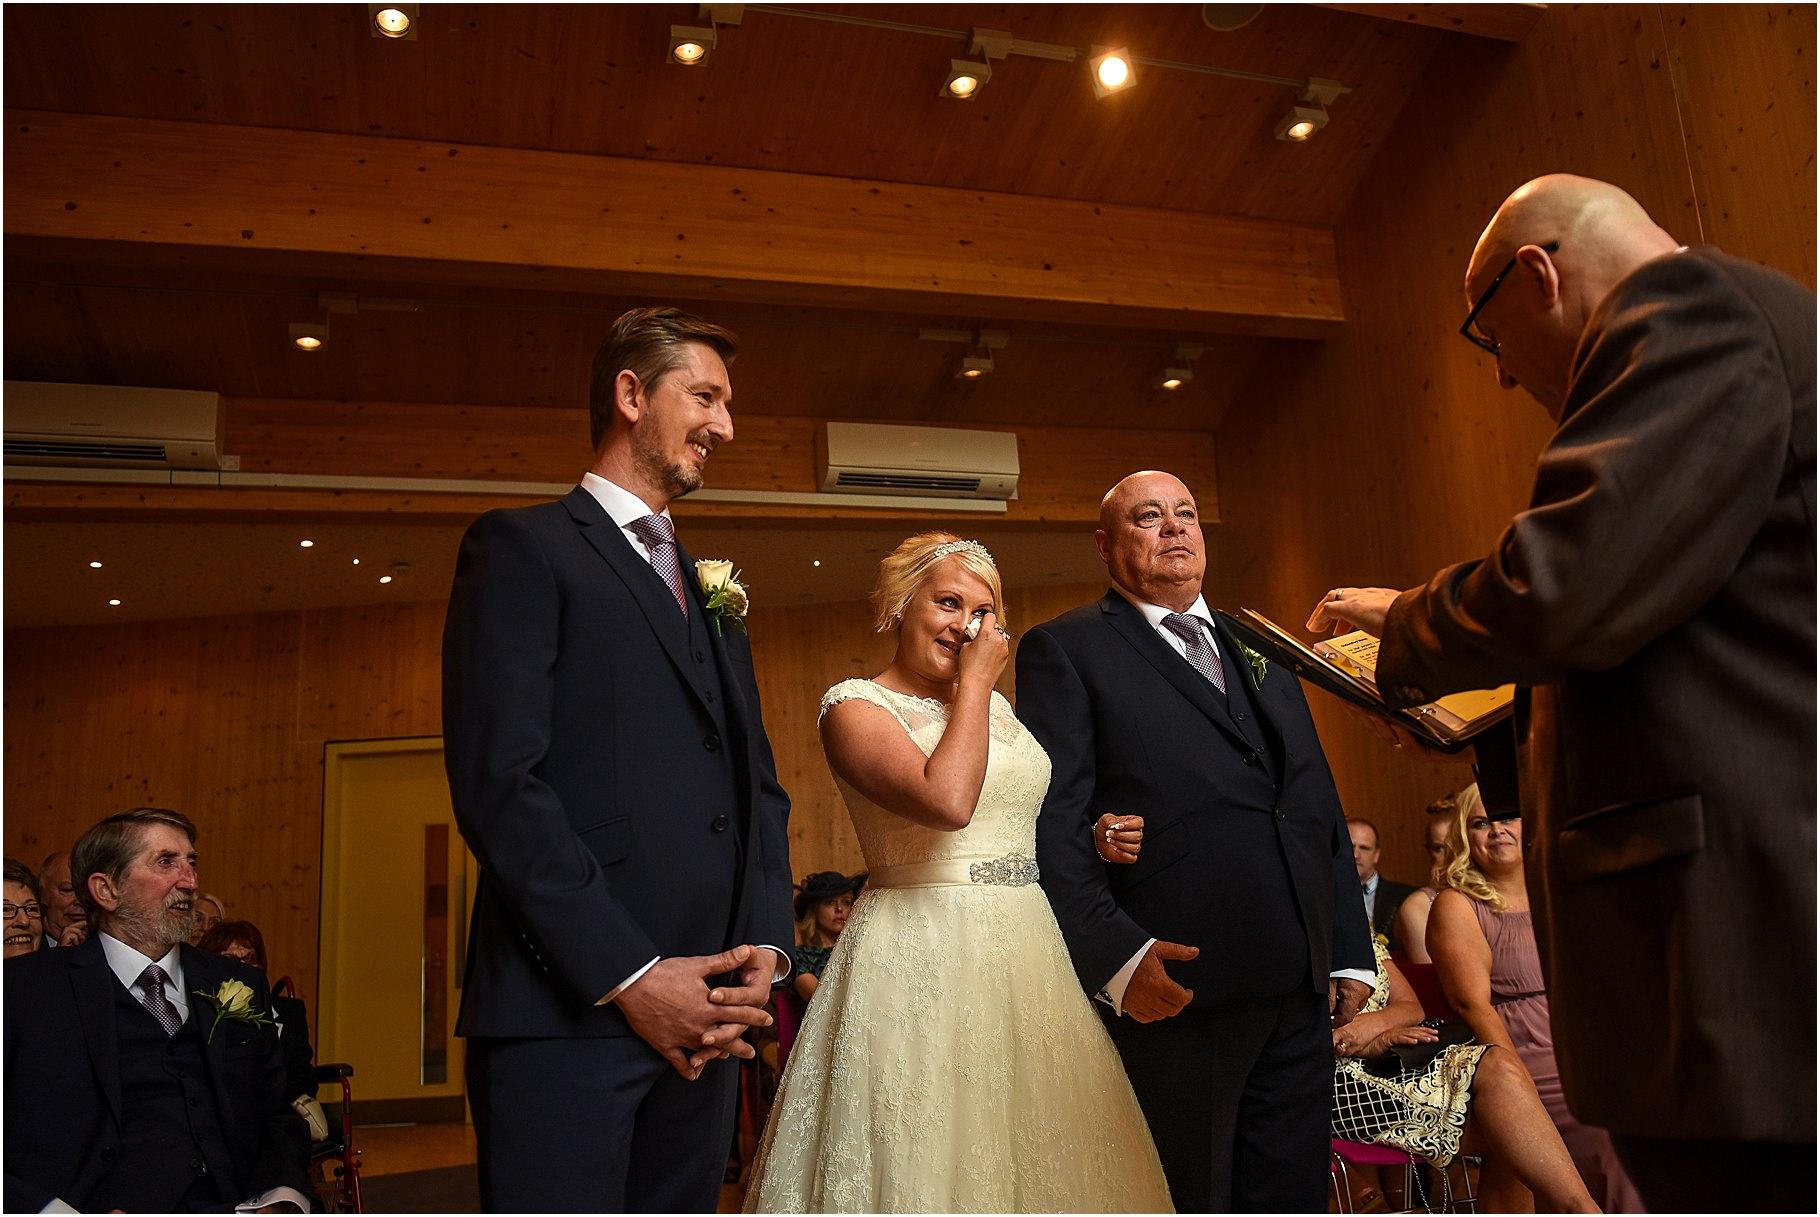 dan-wootton-photography-2017-weddings-092.jpg